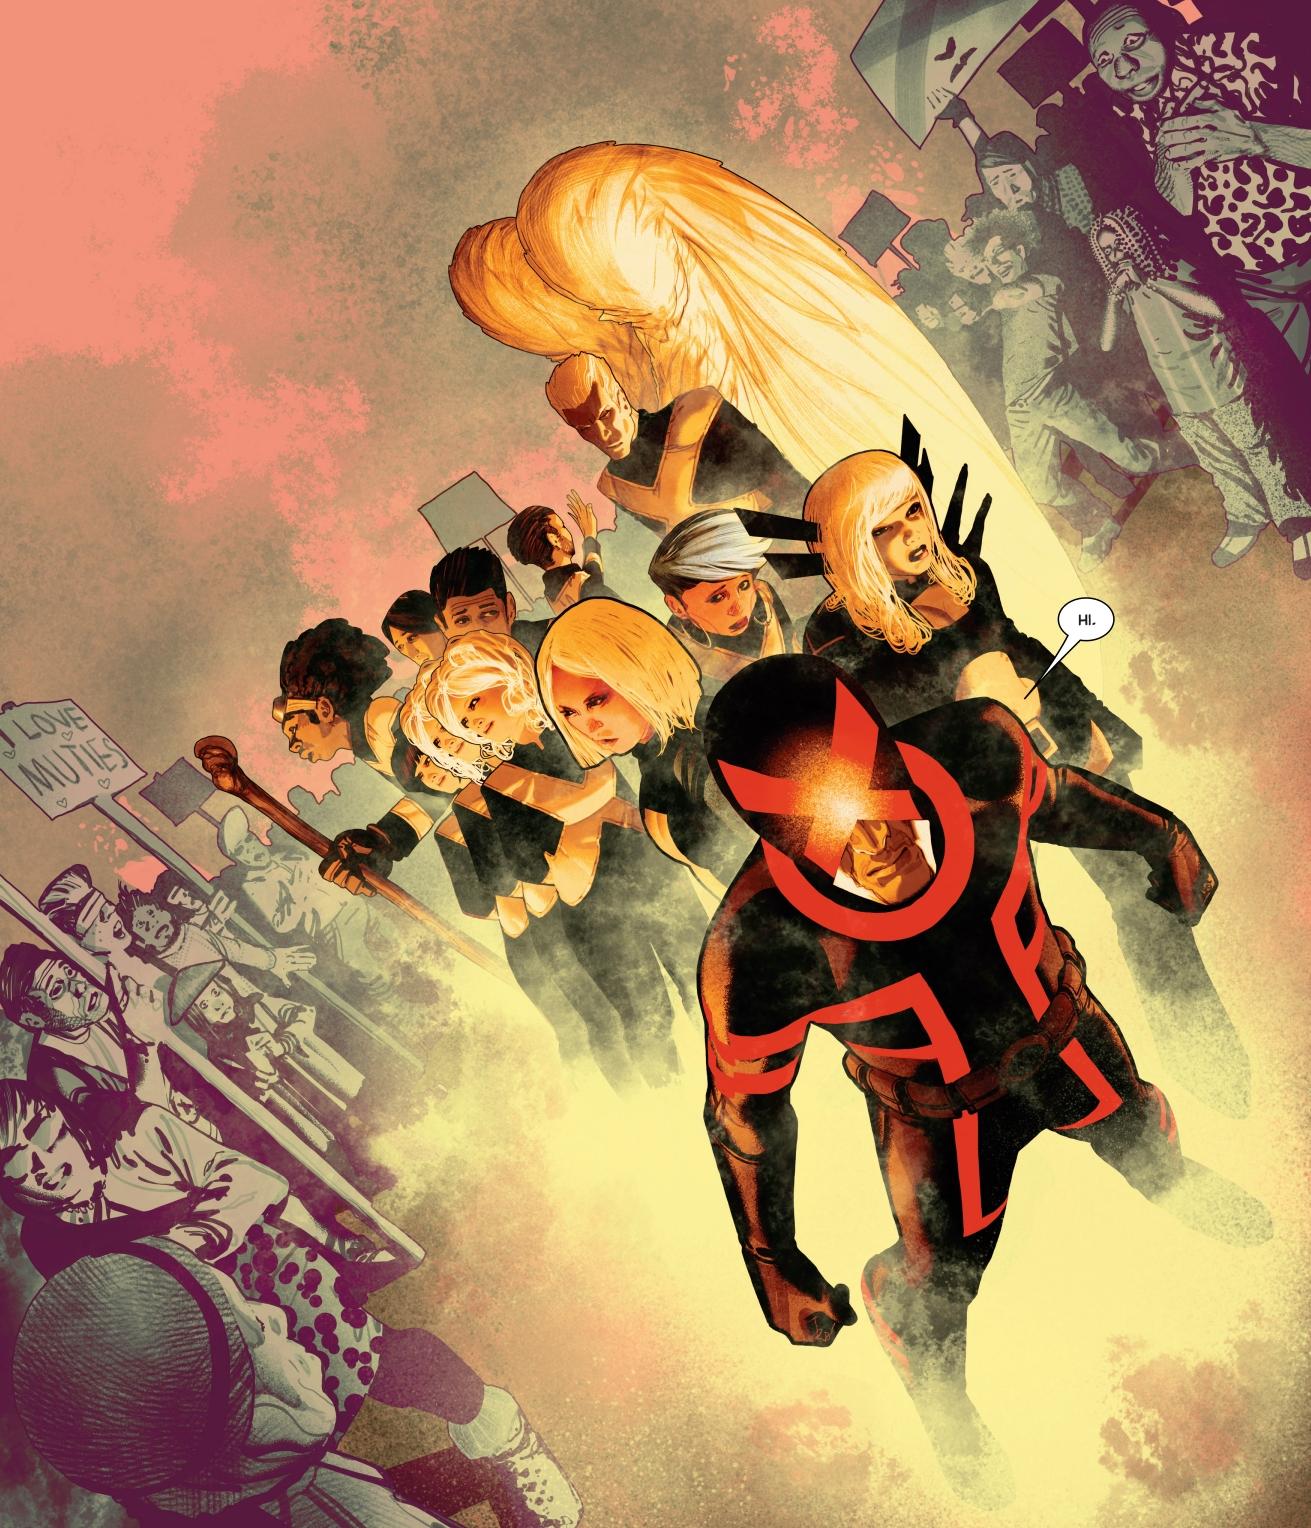 X-Men (New Charles Xavier School) (Earth-616) from Uncanny X-Men Vol 3 10 0001.jpg